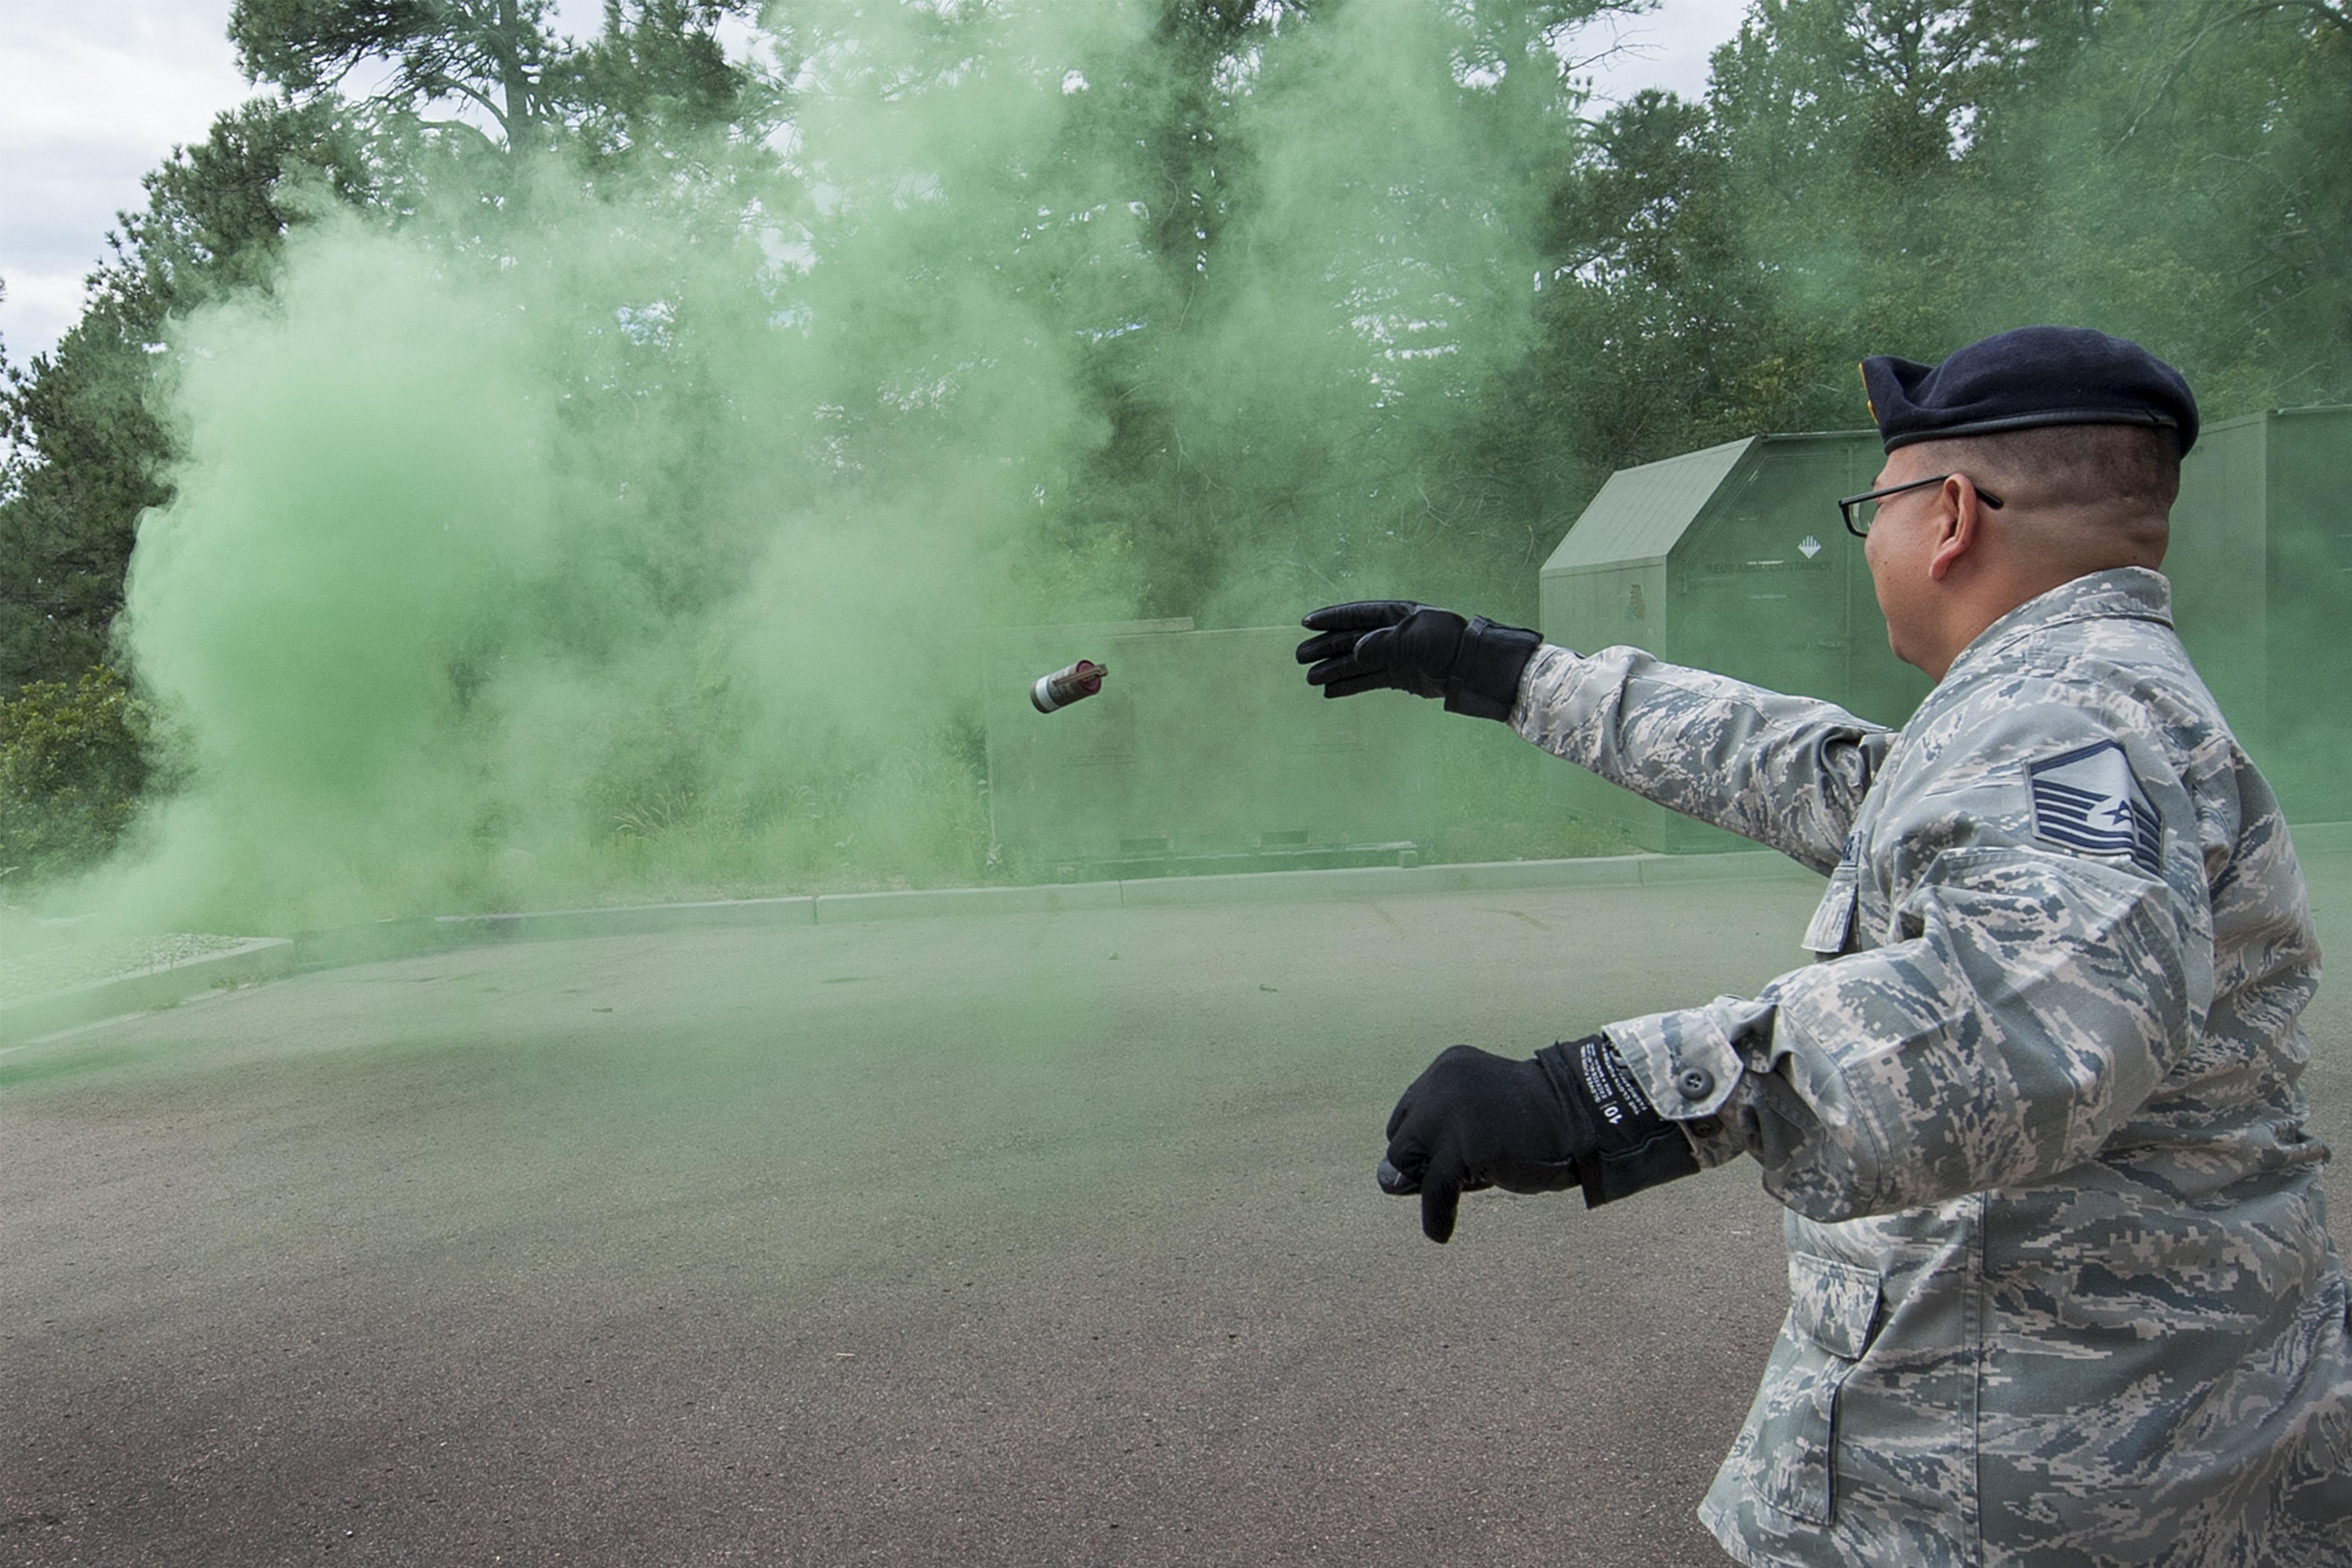 721st SFS conducts Smoke Grenade training at CMAFS